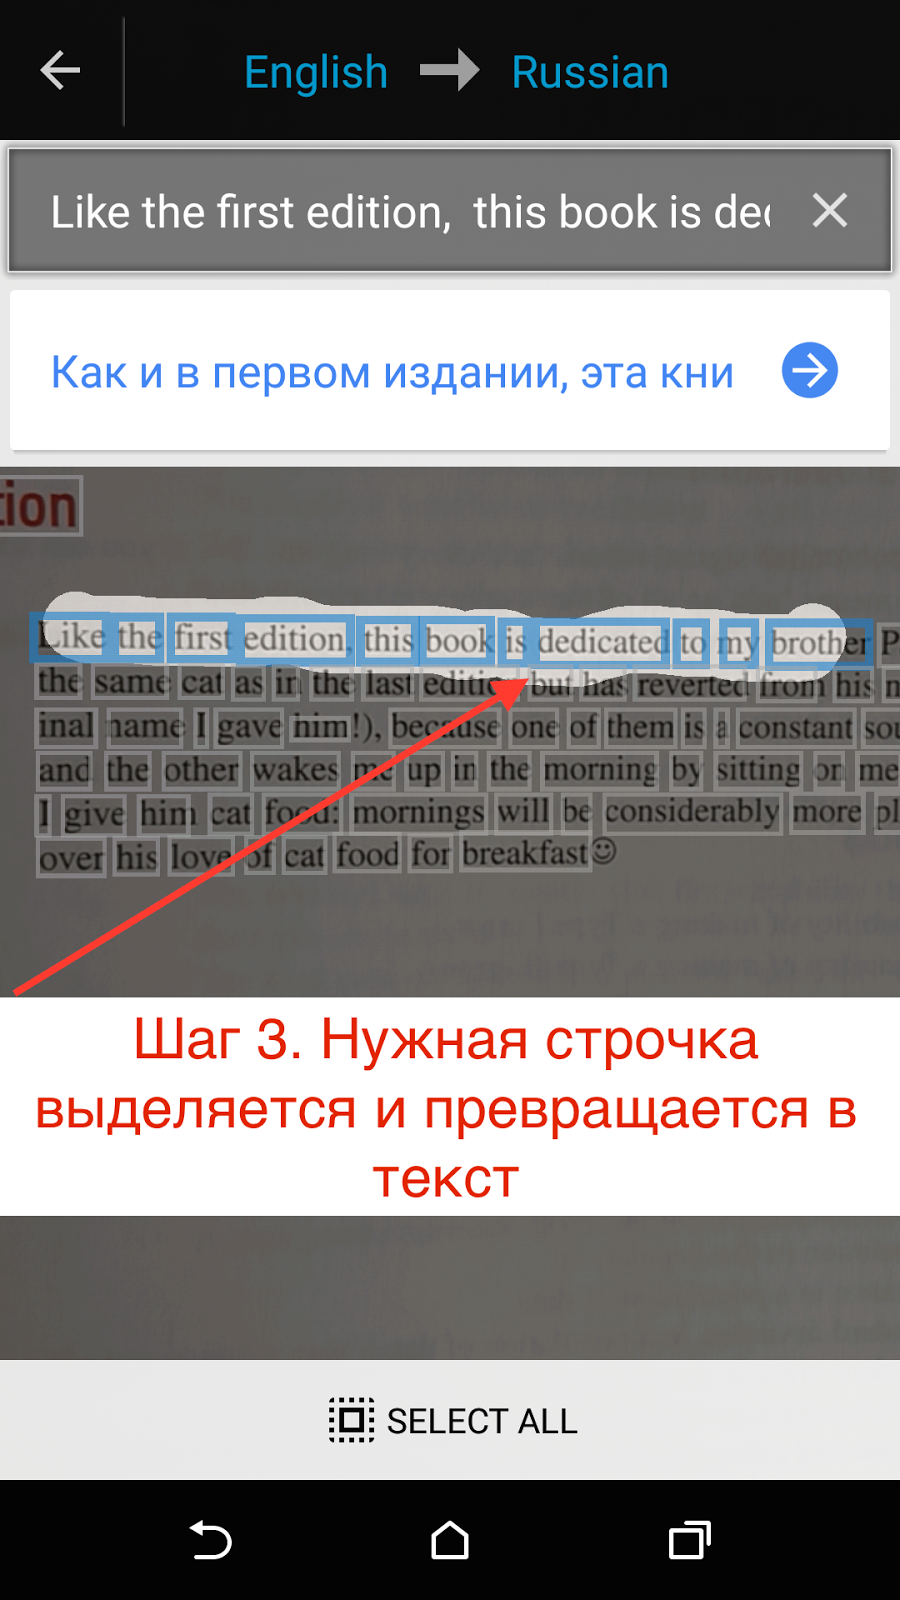 Гугл переводчик 5 класс